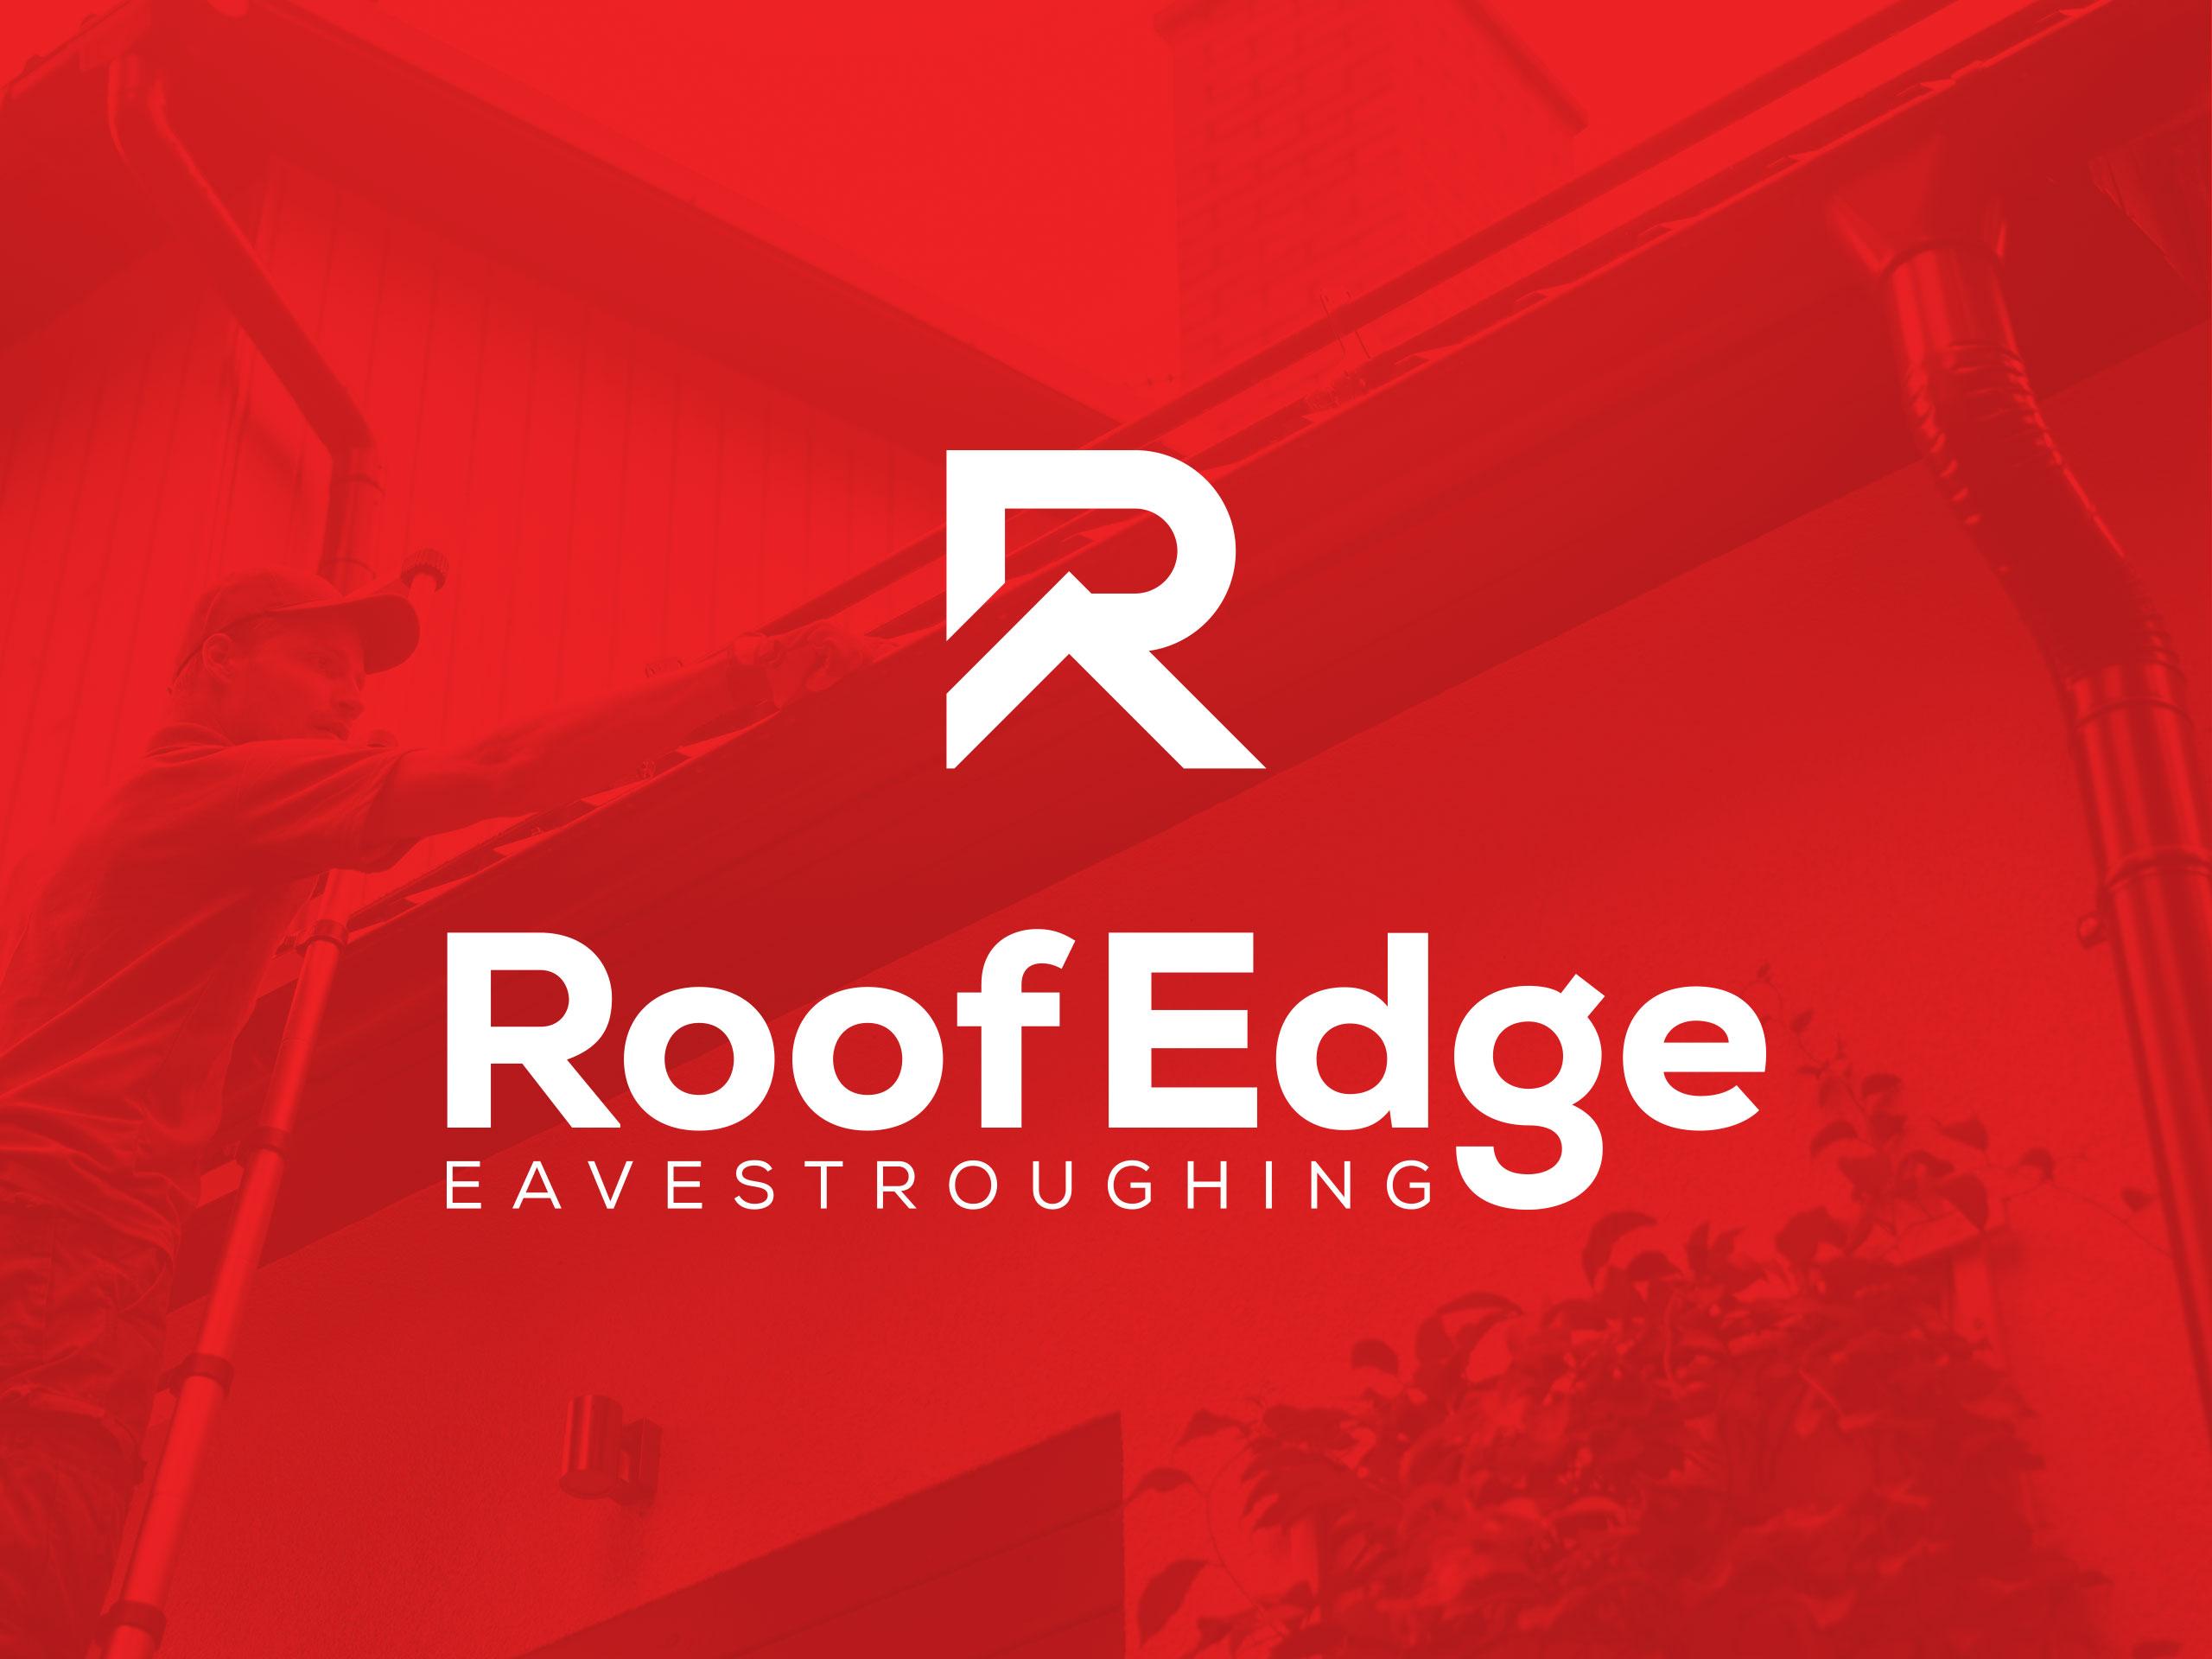 RoofEdge-Eavestroughing-Lethbridge-Logo-Design-by-Hybrid-Media-YQL